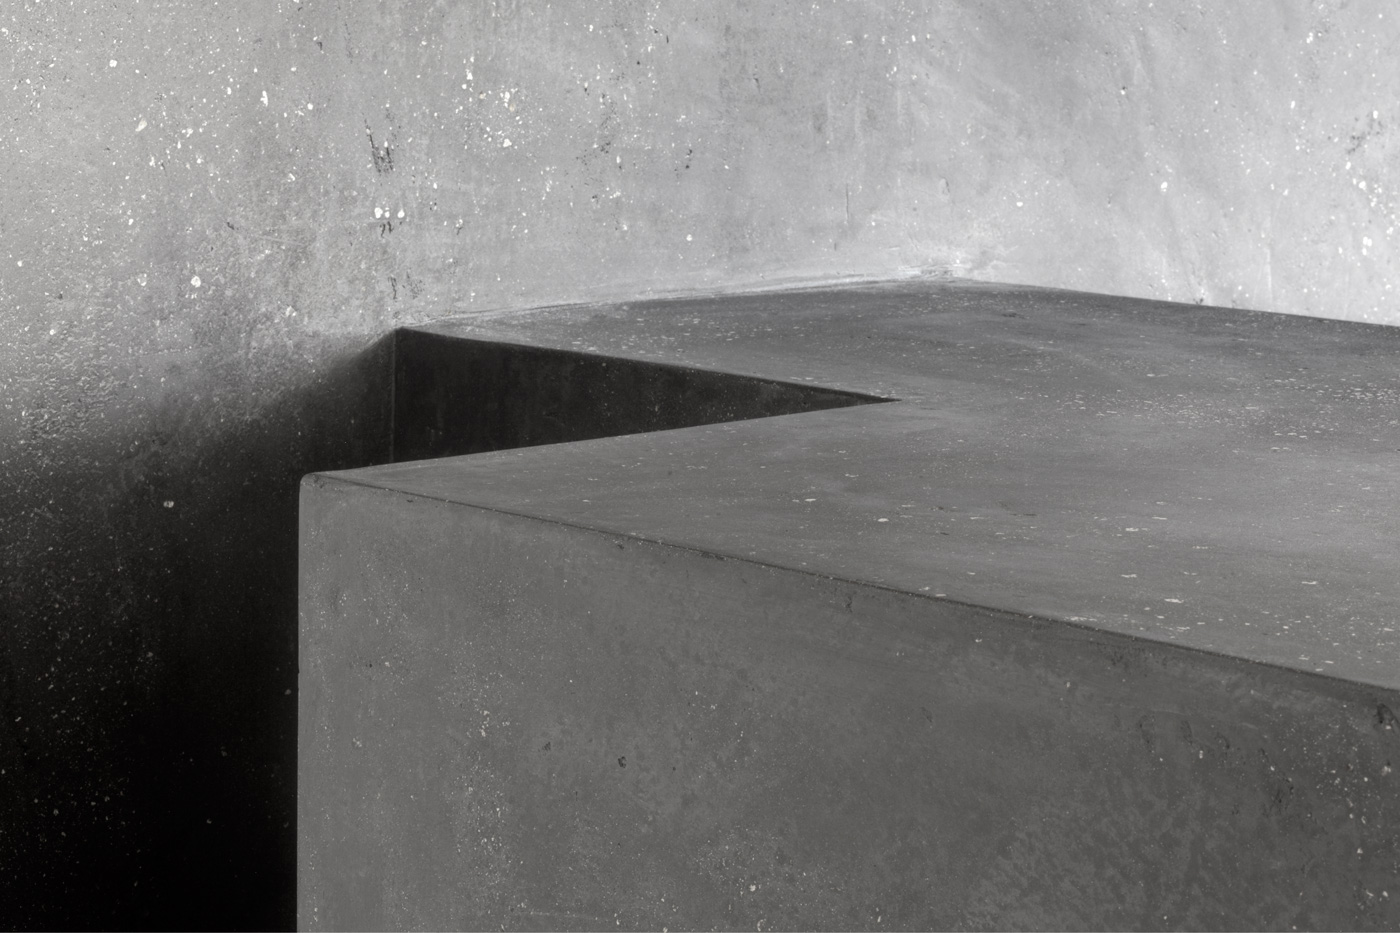 Moling-Oberhuber-IMG_0016_GW.jpg